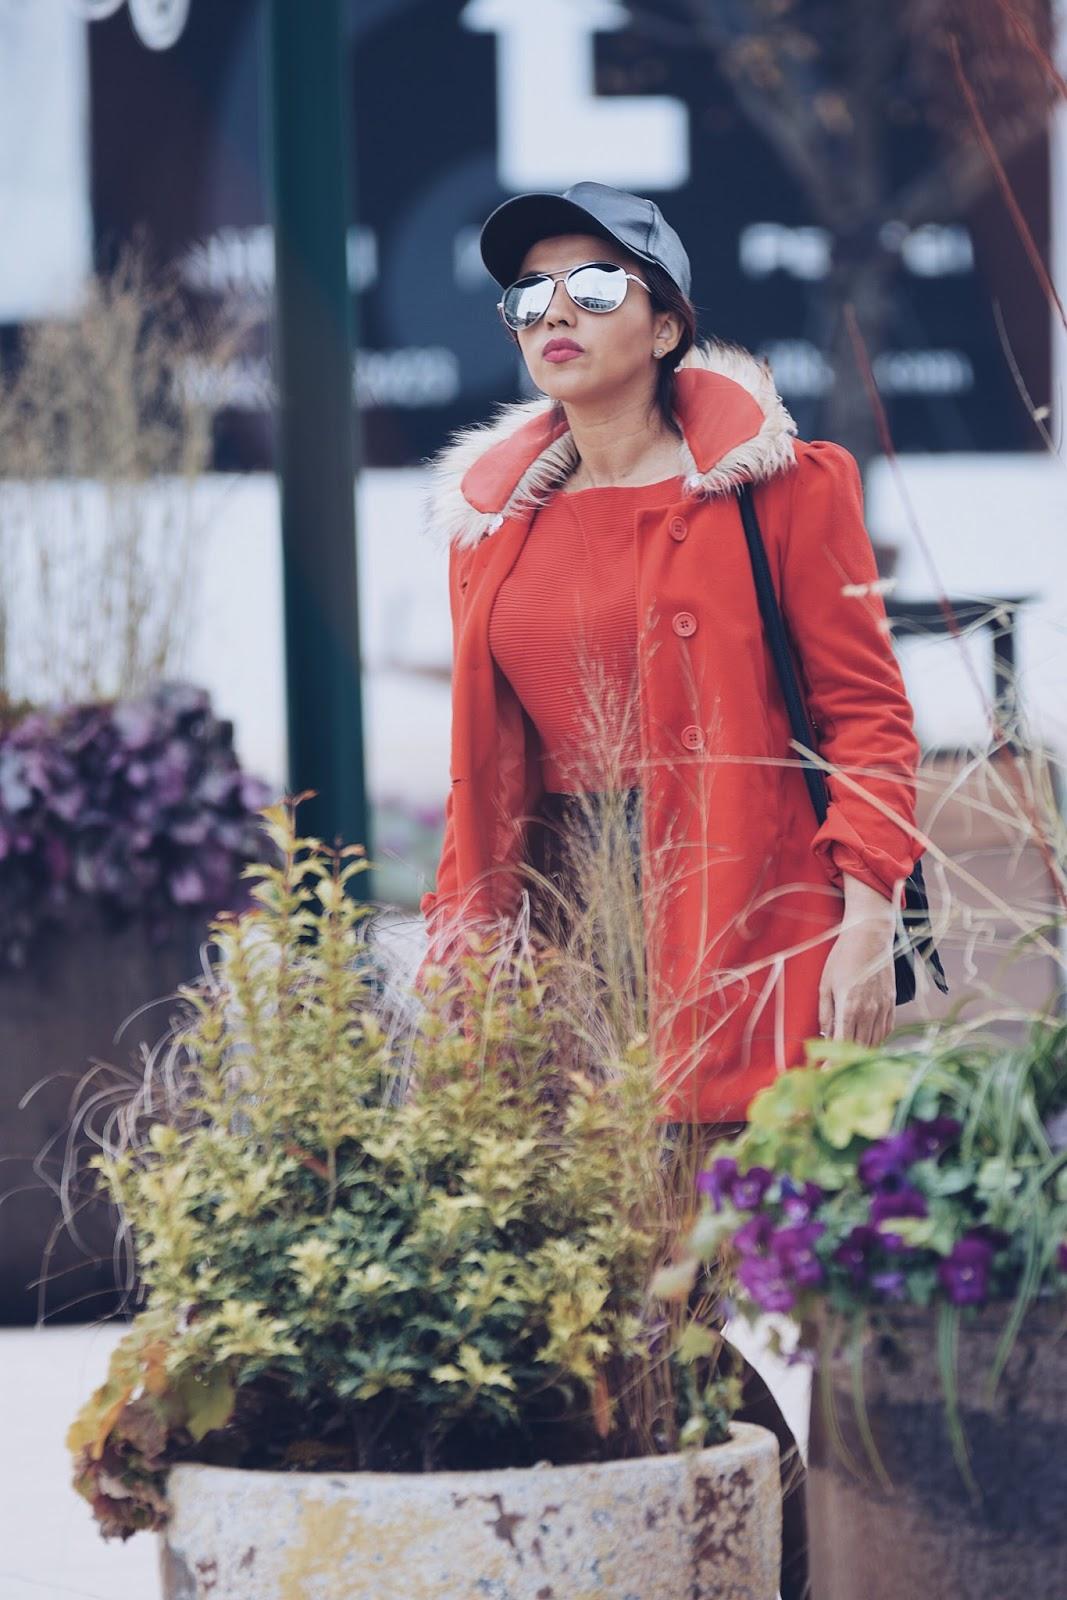 Styling a red coat by mariestilo- Wearing:  Red Coat: LightInTheBox  Mini Skirt: Choies